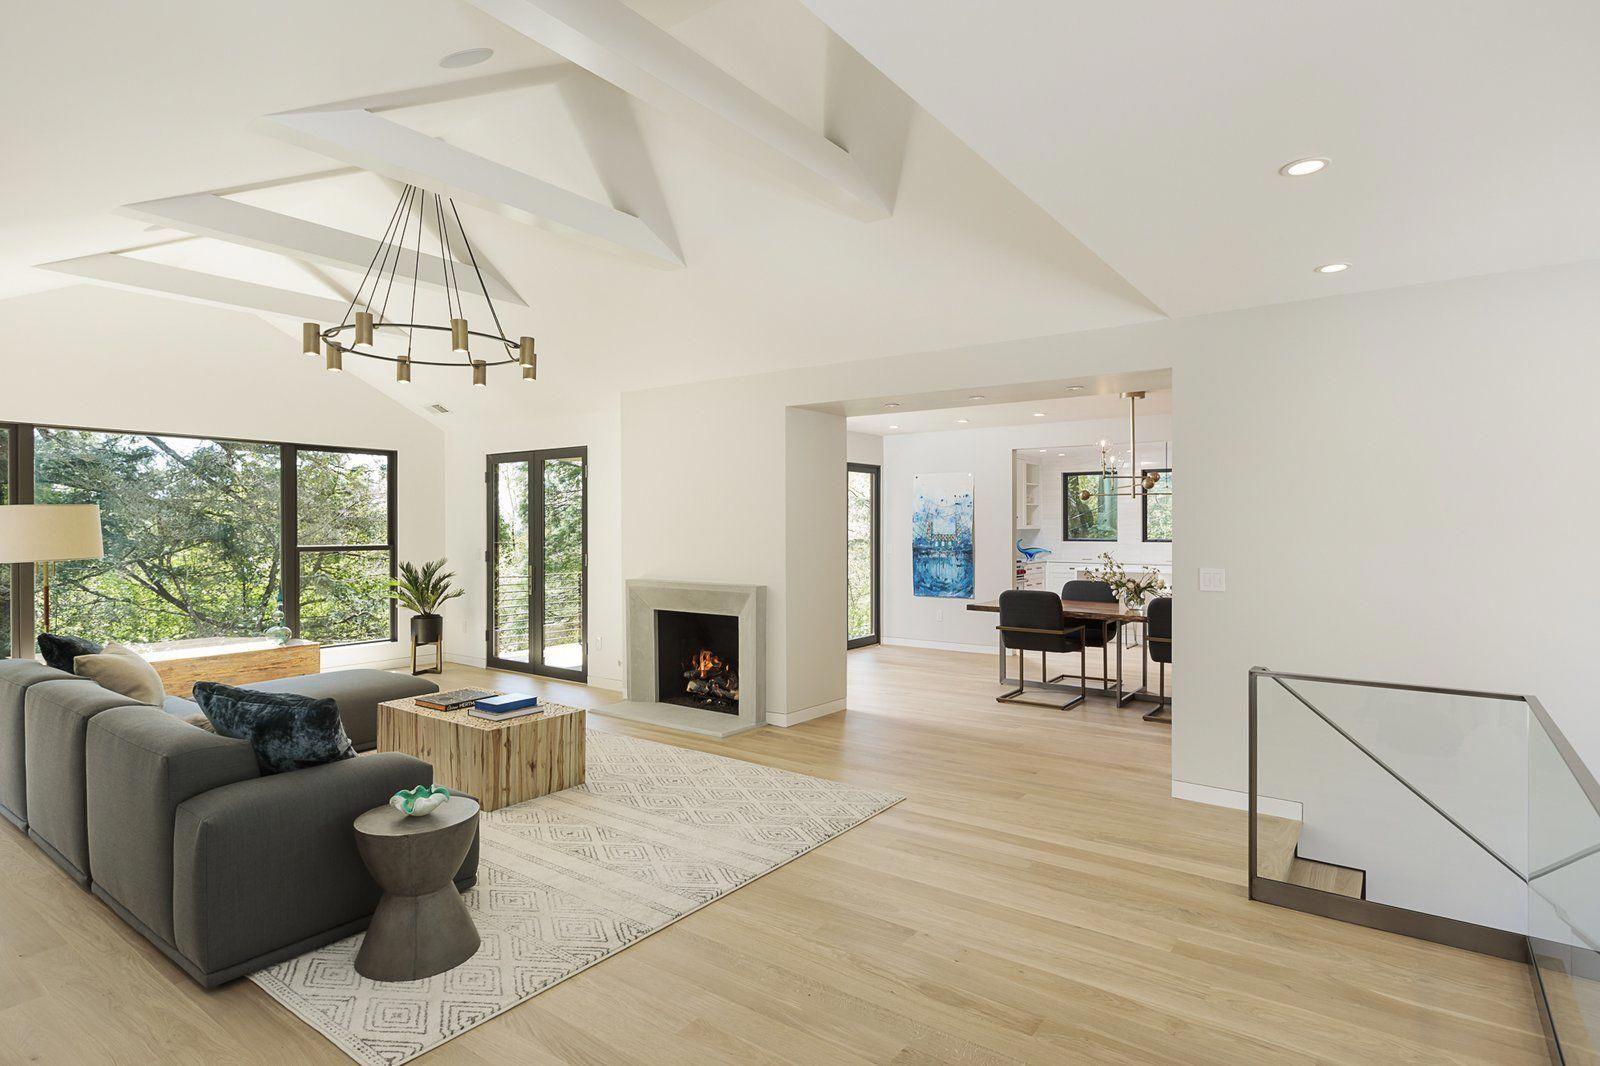 Living Room Light Hardwood Floor Rug Floor Coffee Tables